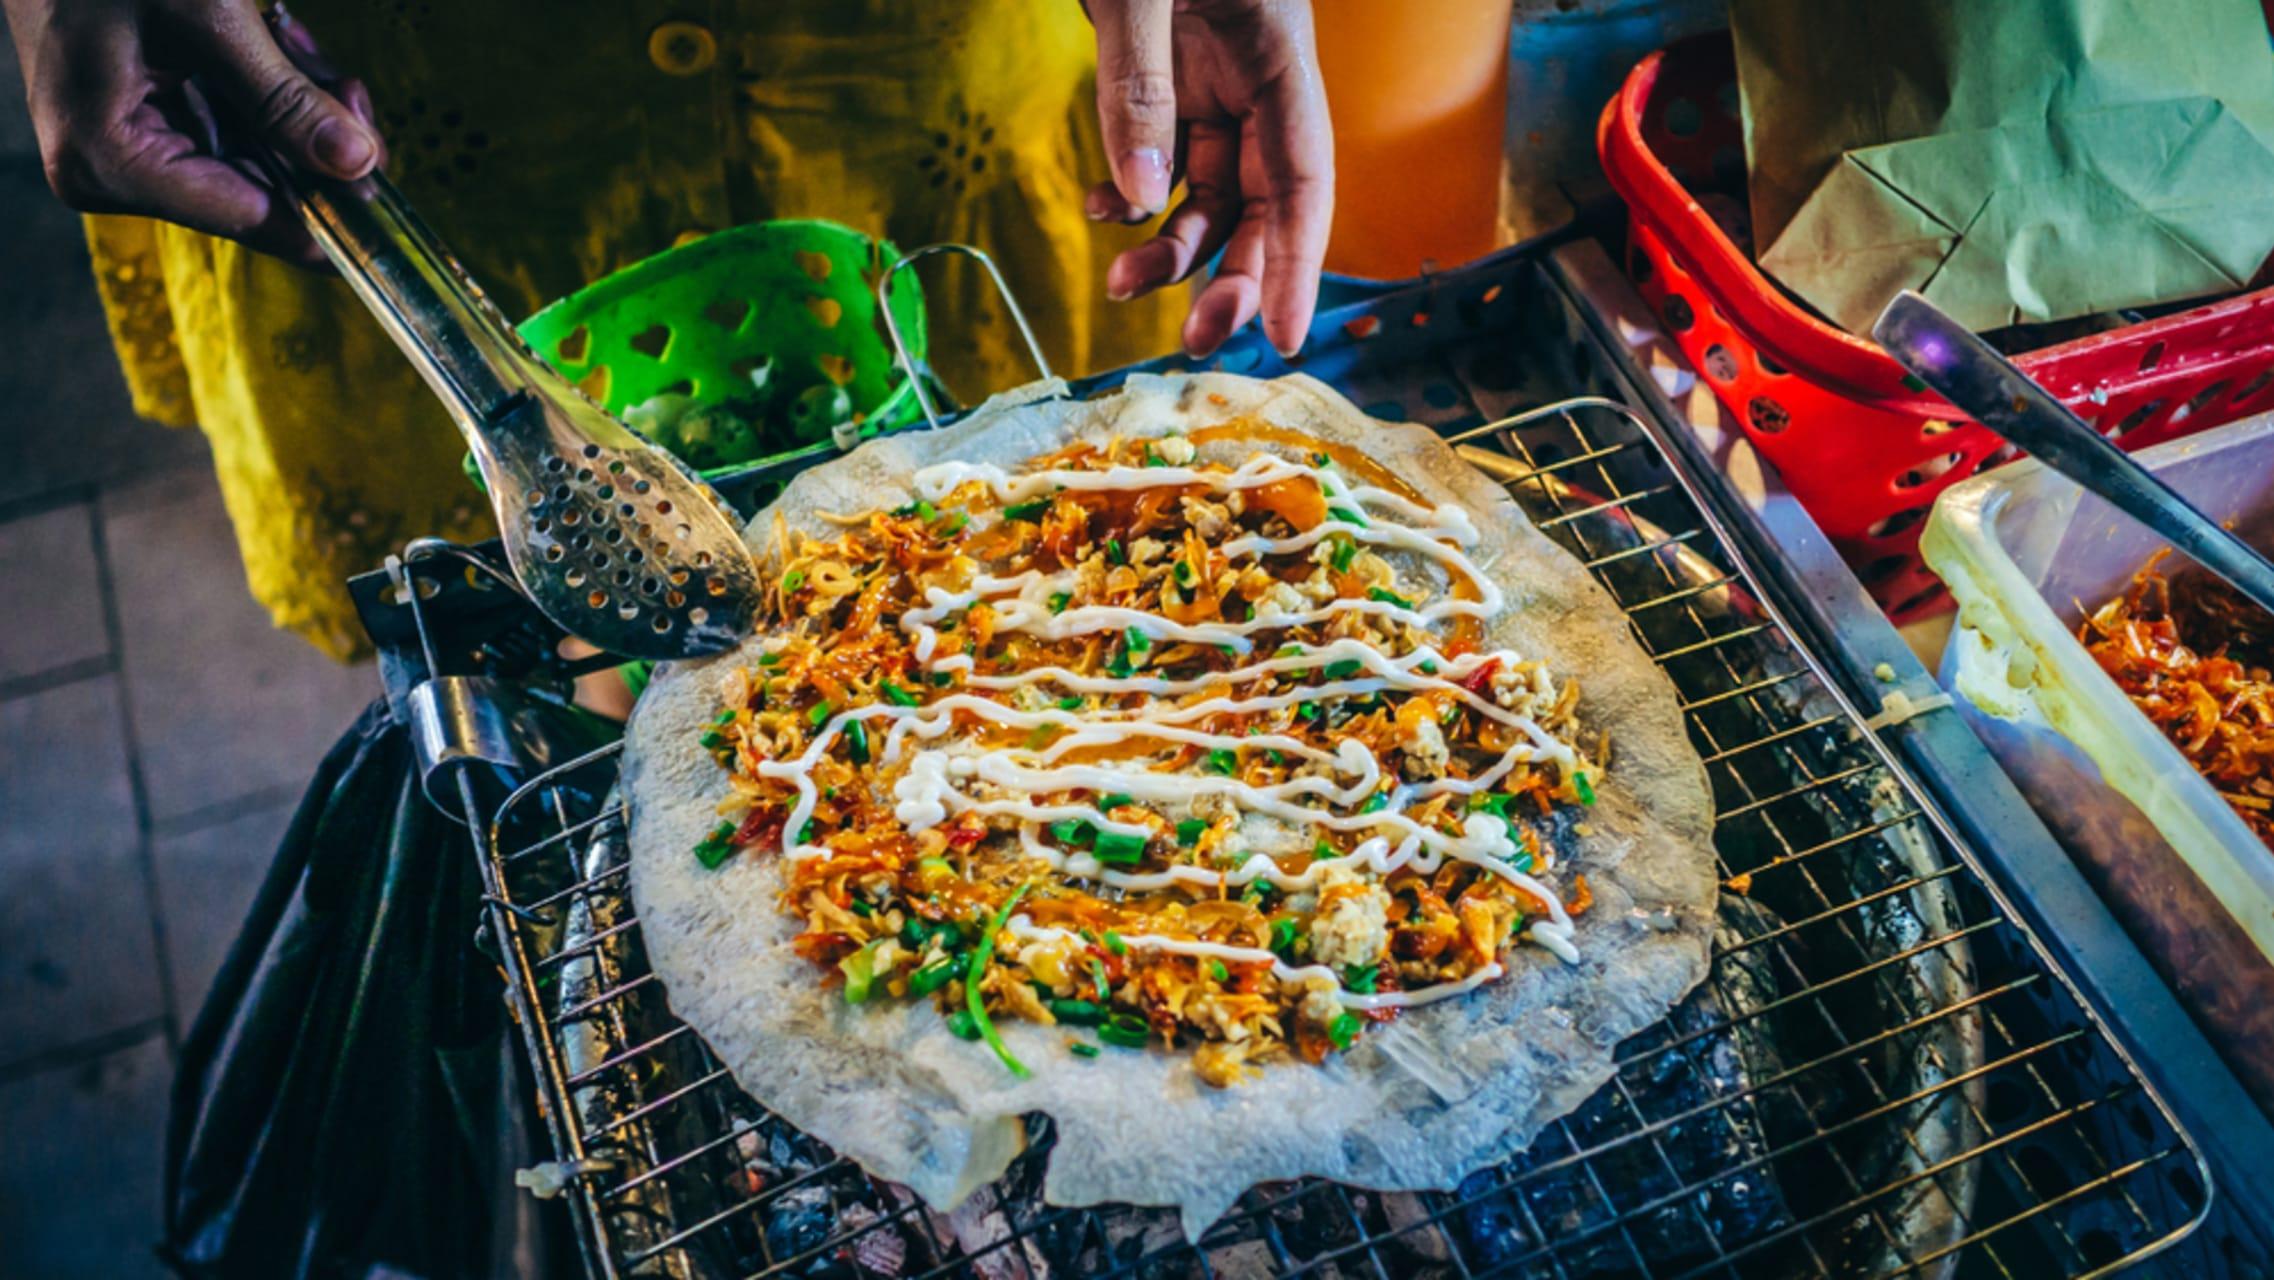 Ho Chi Minh City - Saigon Secret Gems - Day 2: All About Streetfood